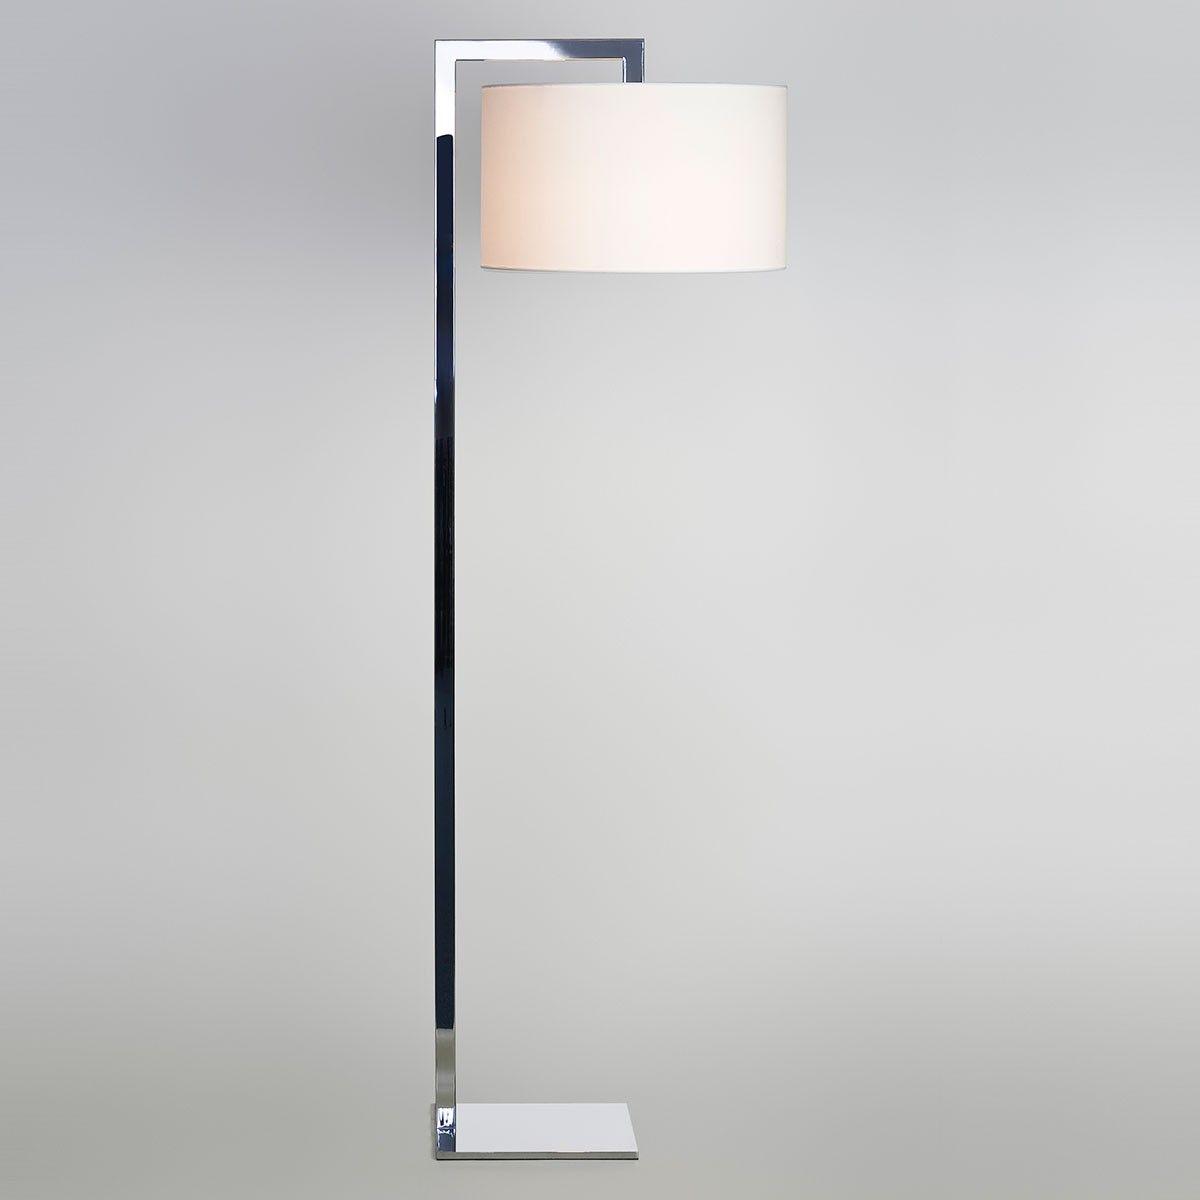 Astro Ravello Floor Polished Chrome Floor Lamp With White Large Drum Shade Chrome Floor Lamps Modern Floor Lamps Floor Lamp